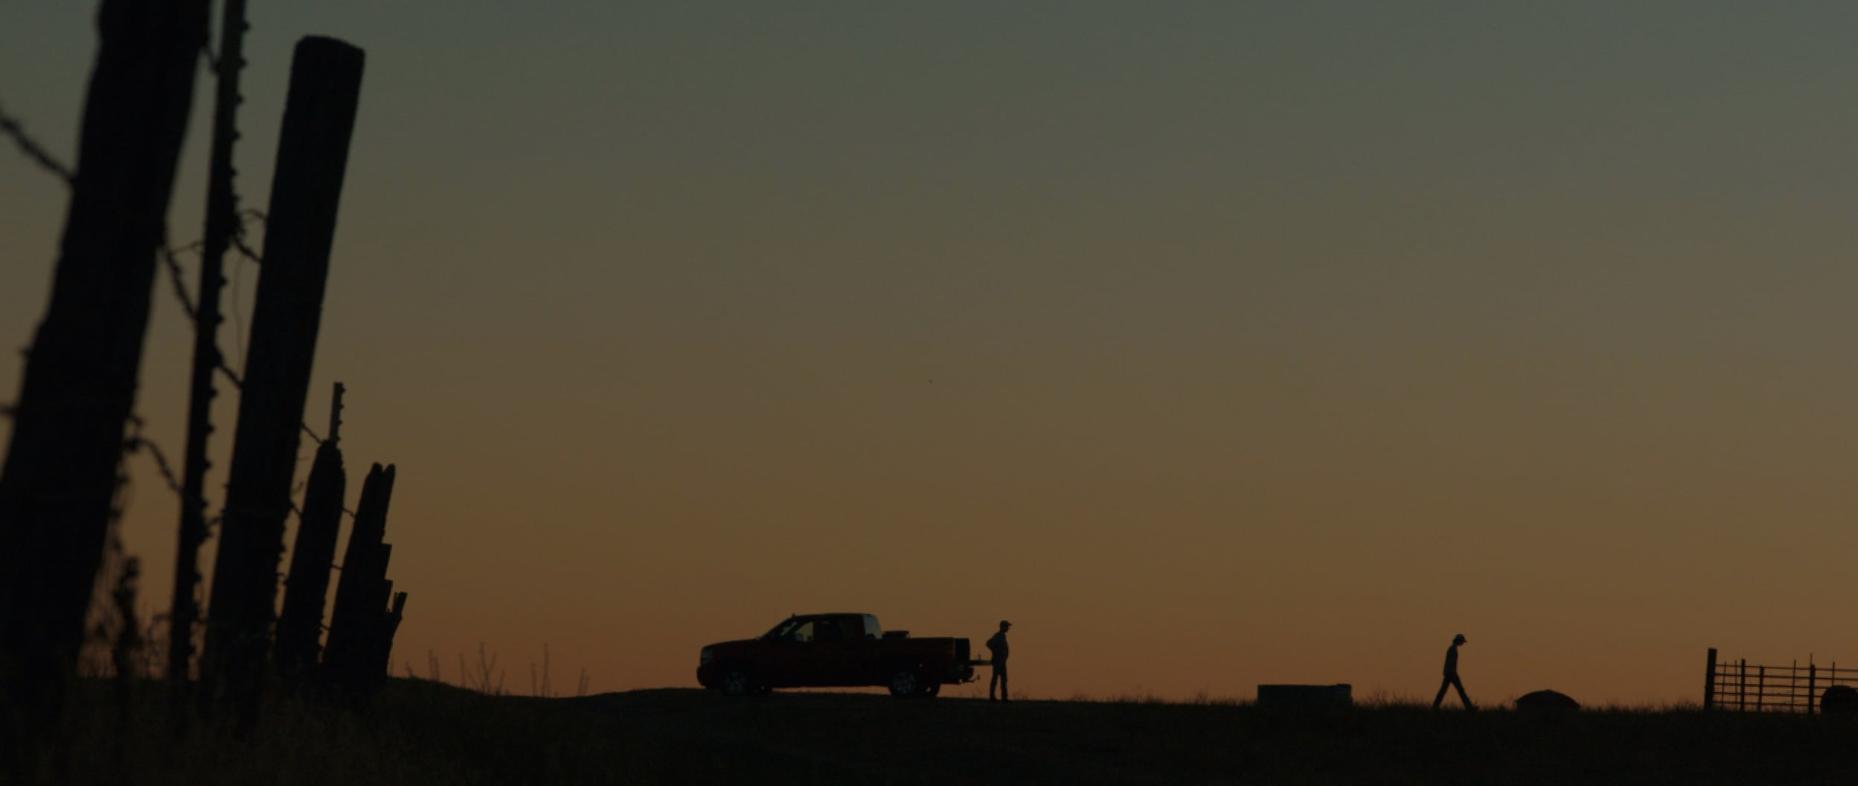 Listen      feature film | 2014  Director: Erahm Christopher  camera: Arri Alexa